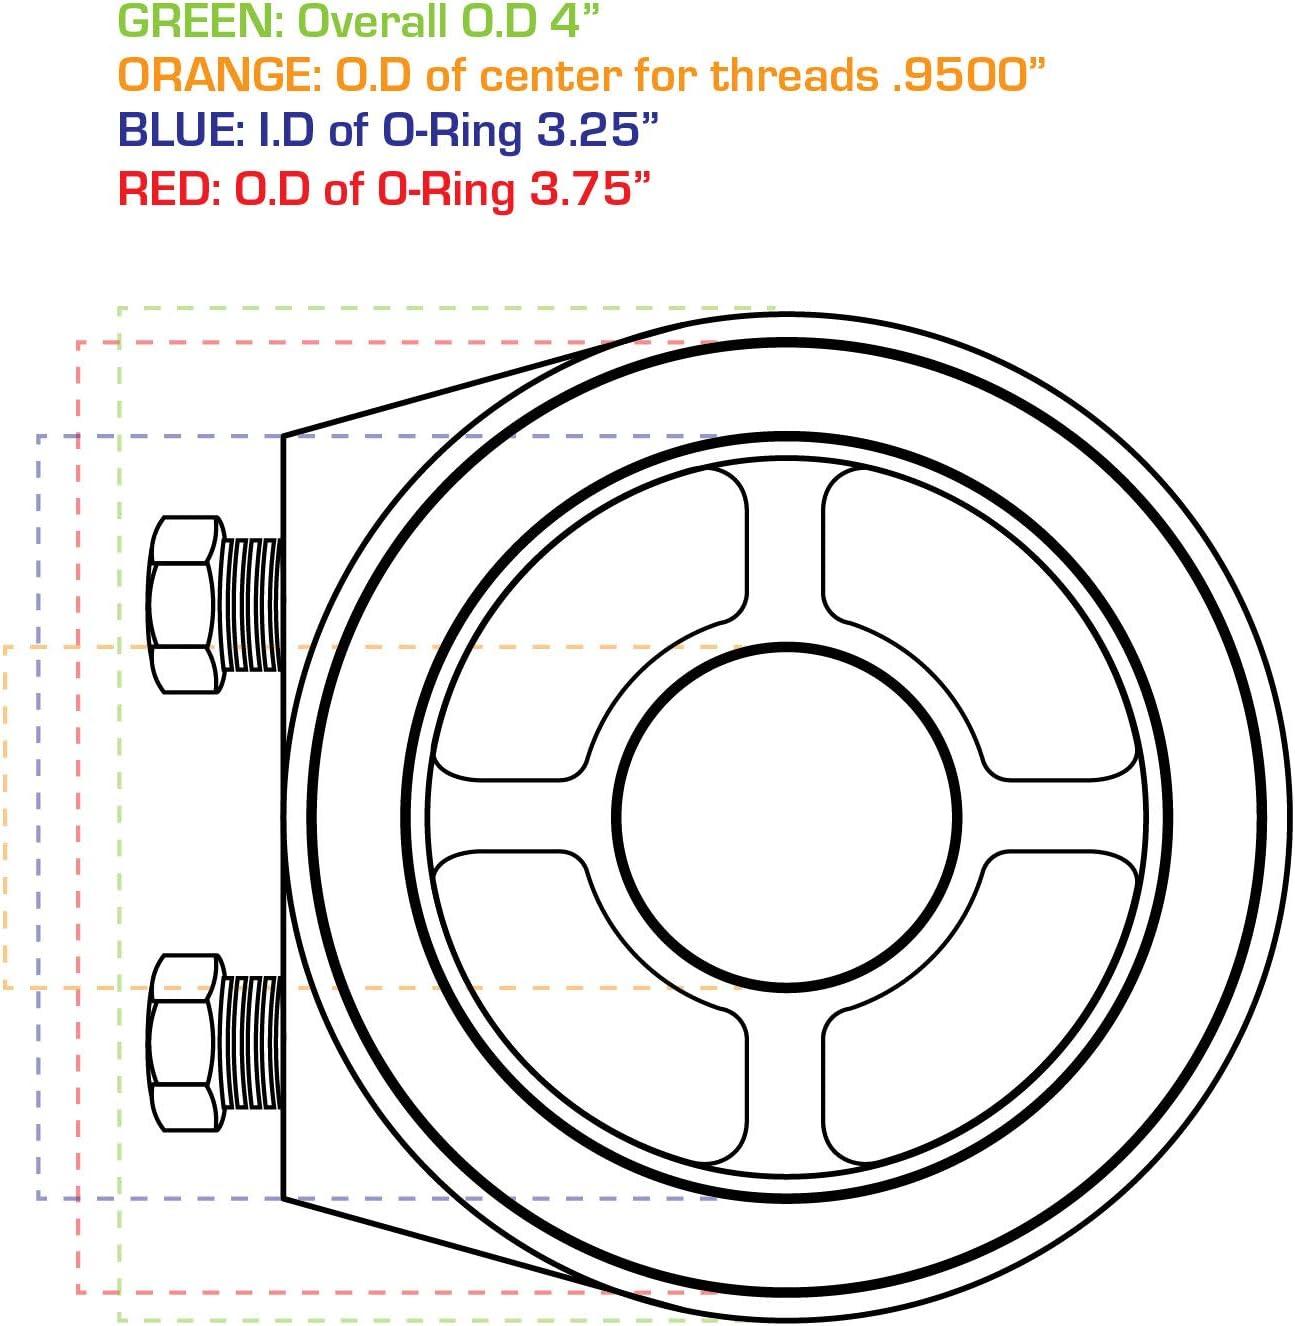 Buick Pontiac Oil Filter Adapter plate 13//16 UNF-16 sandwich plate Chevy